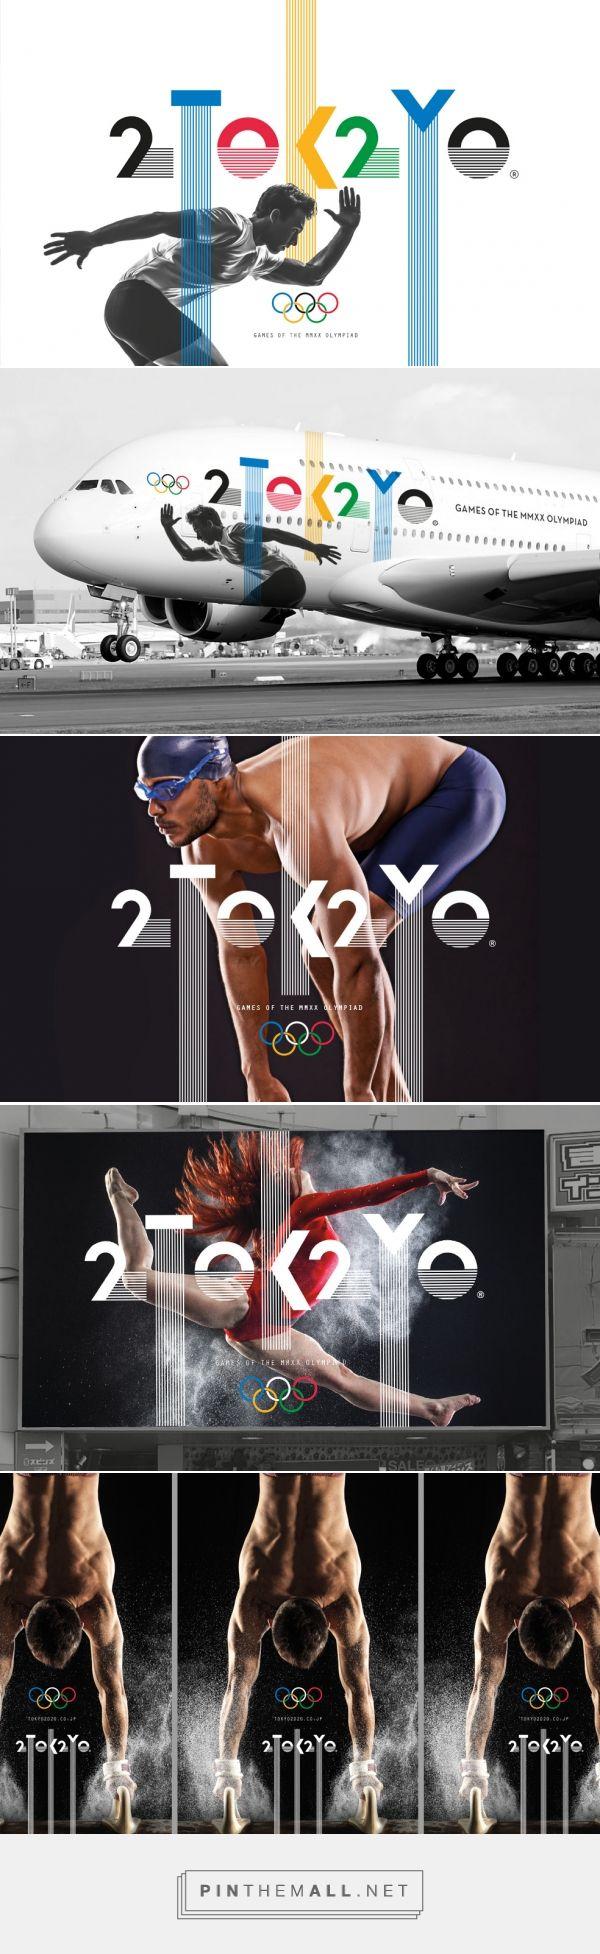 branding / Identity | Tokyo 2020 Olympics #logo #design #branding